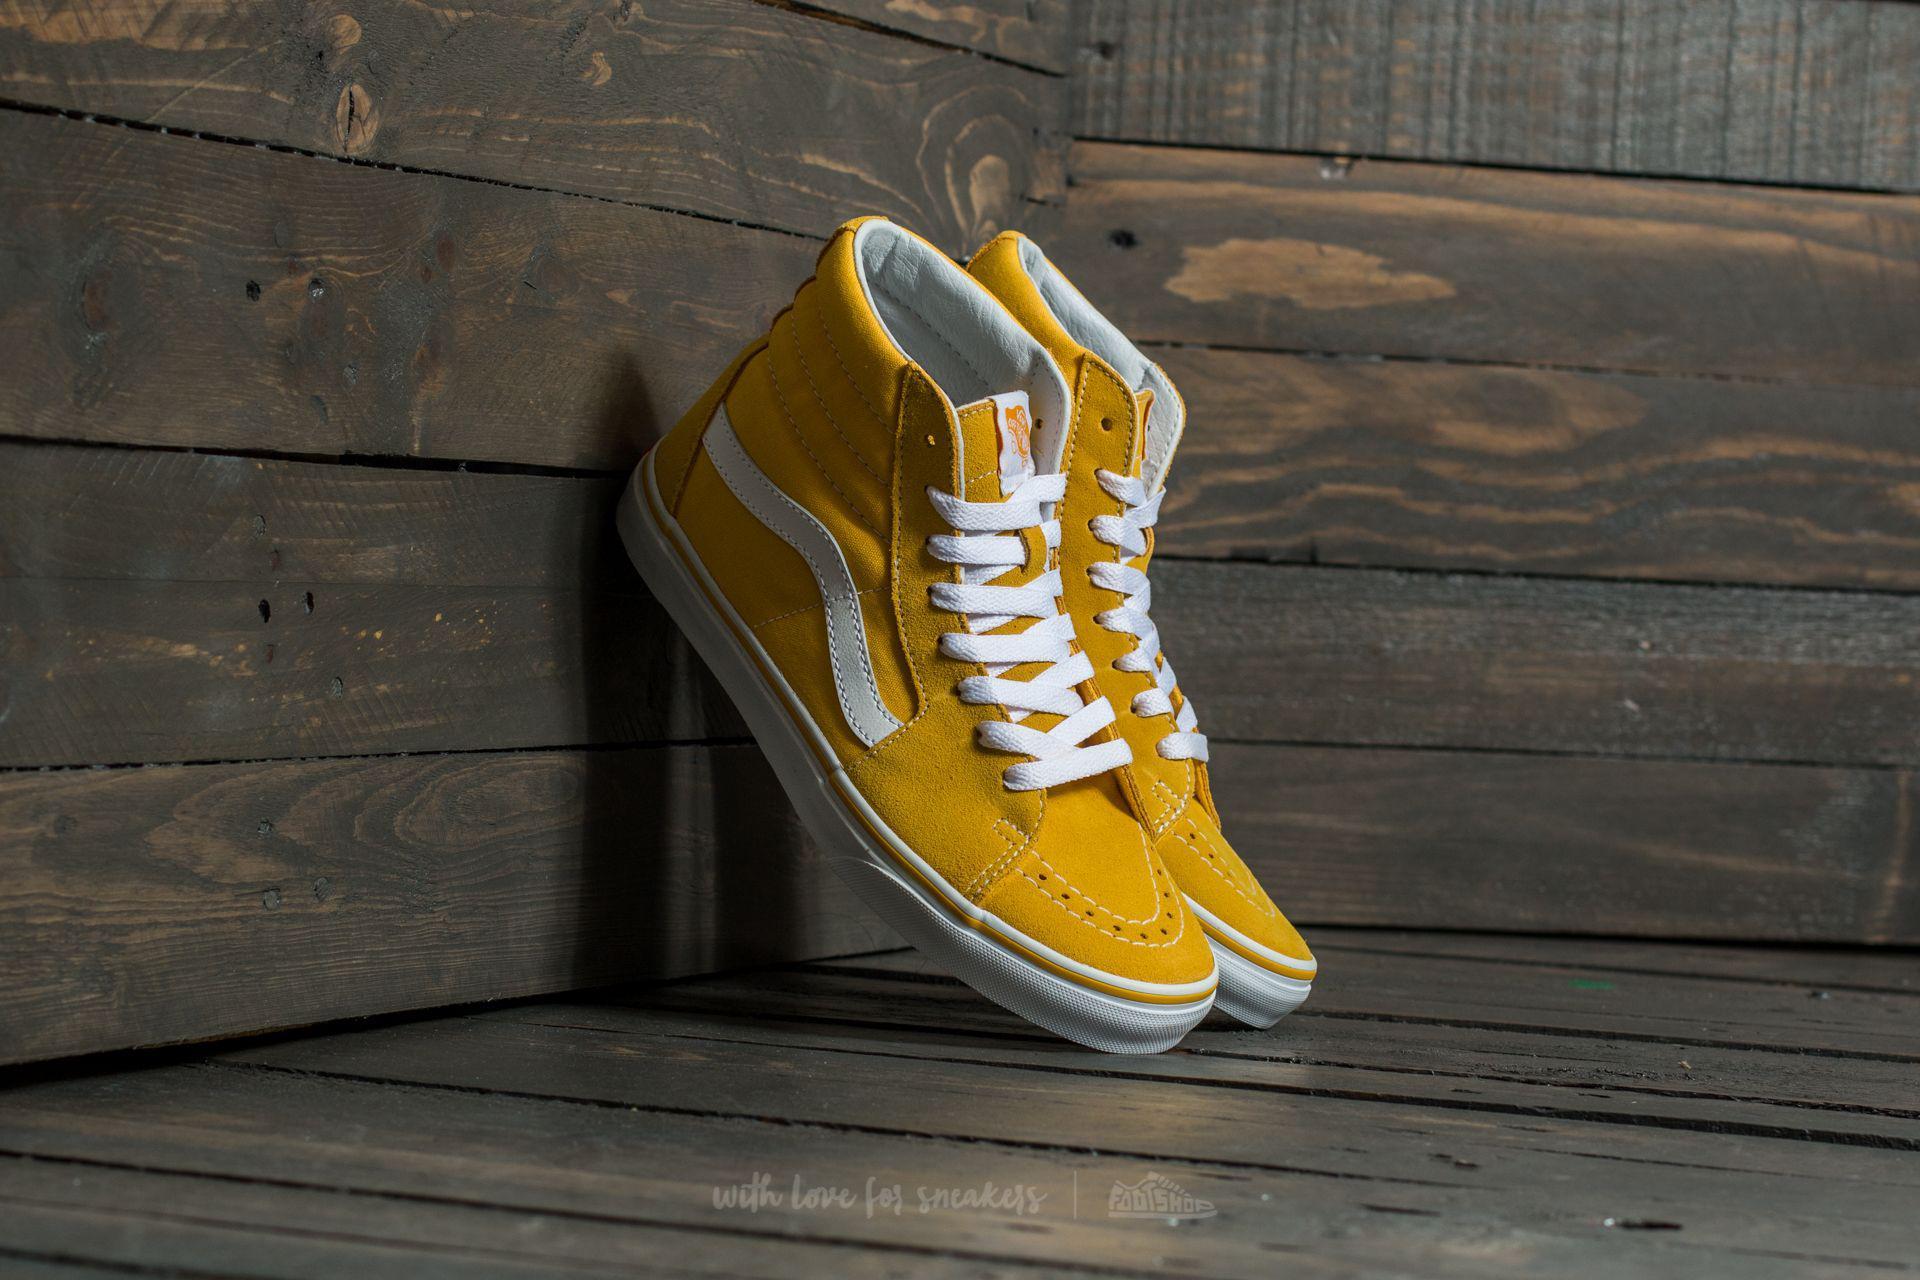 Lyst - Vans Sk8-hi (suede canvas) Spectra Yellow  True White in ... 056978d8d